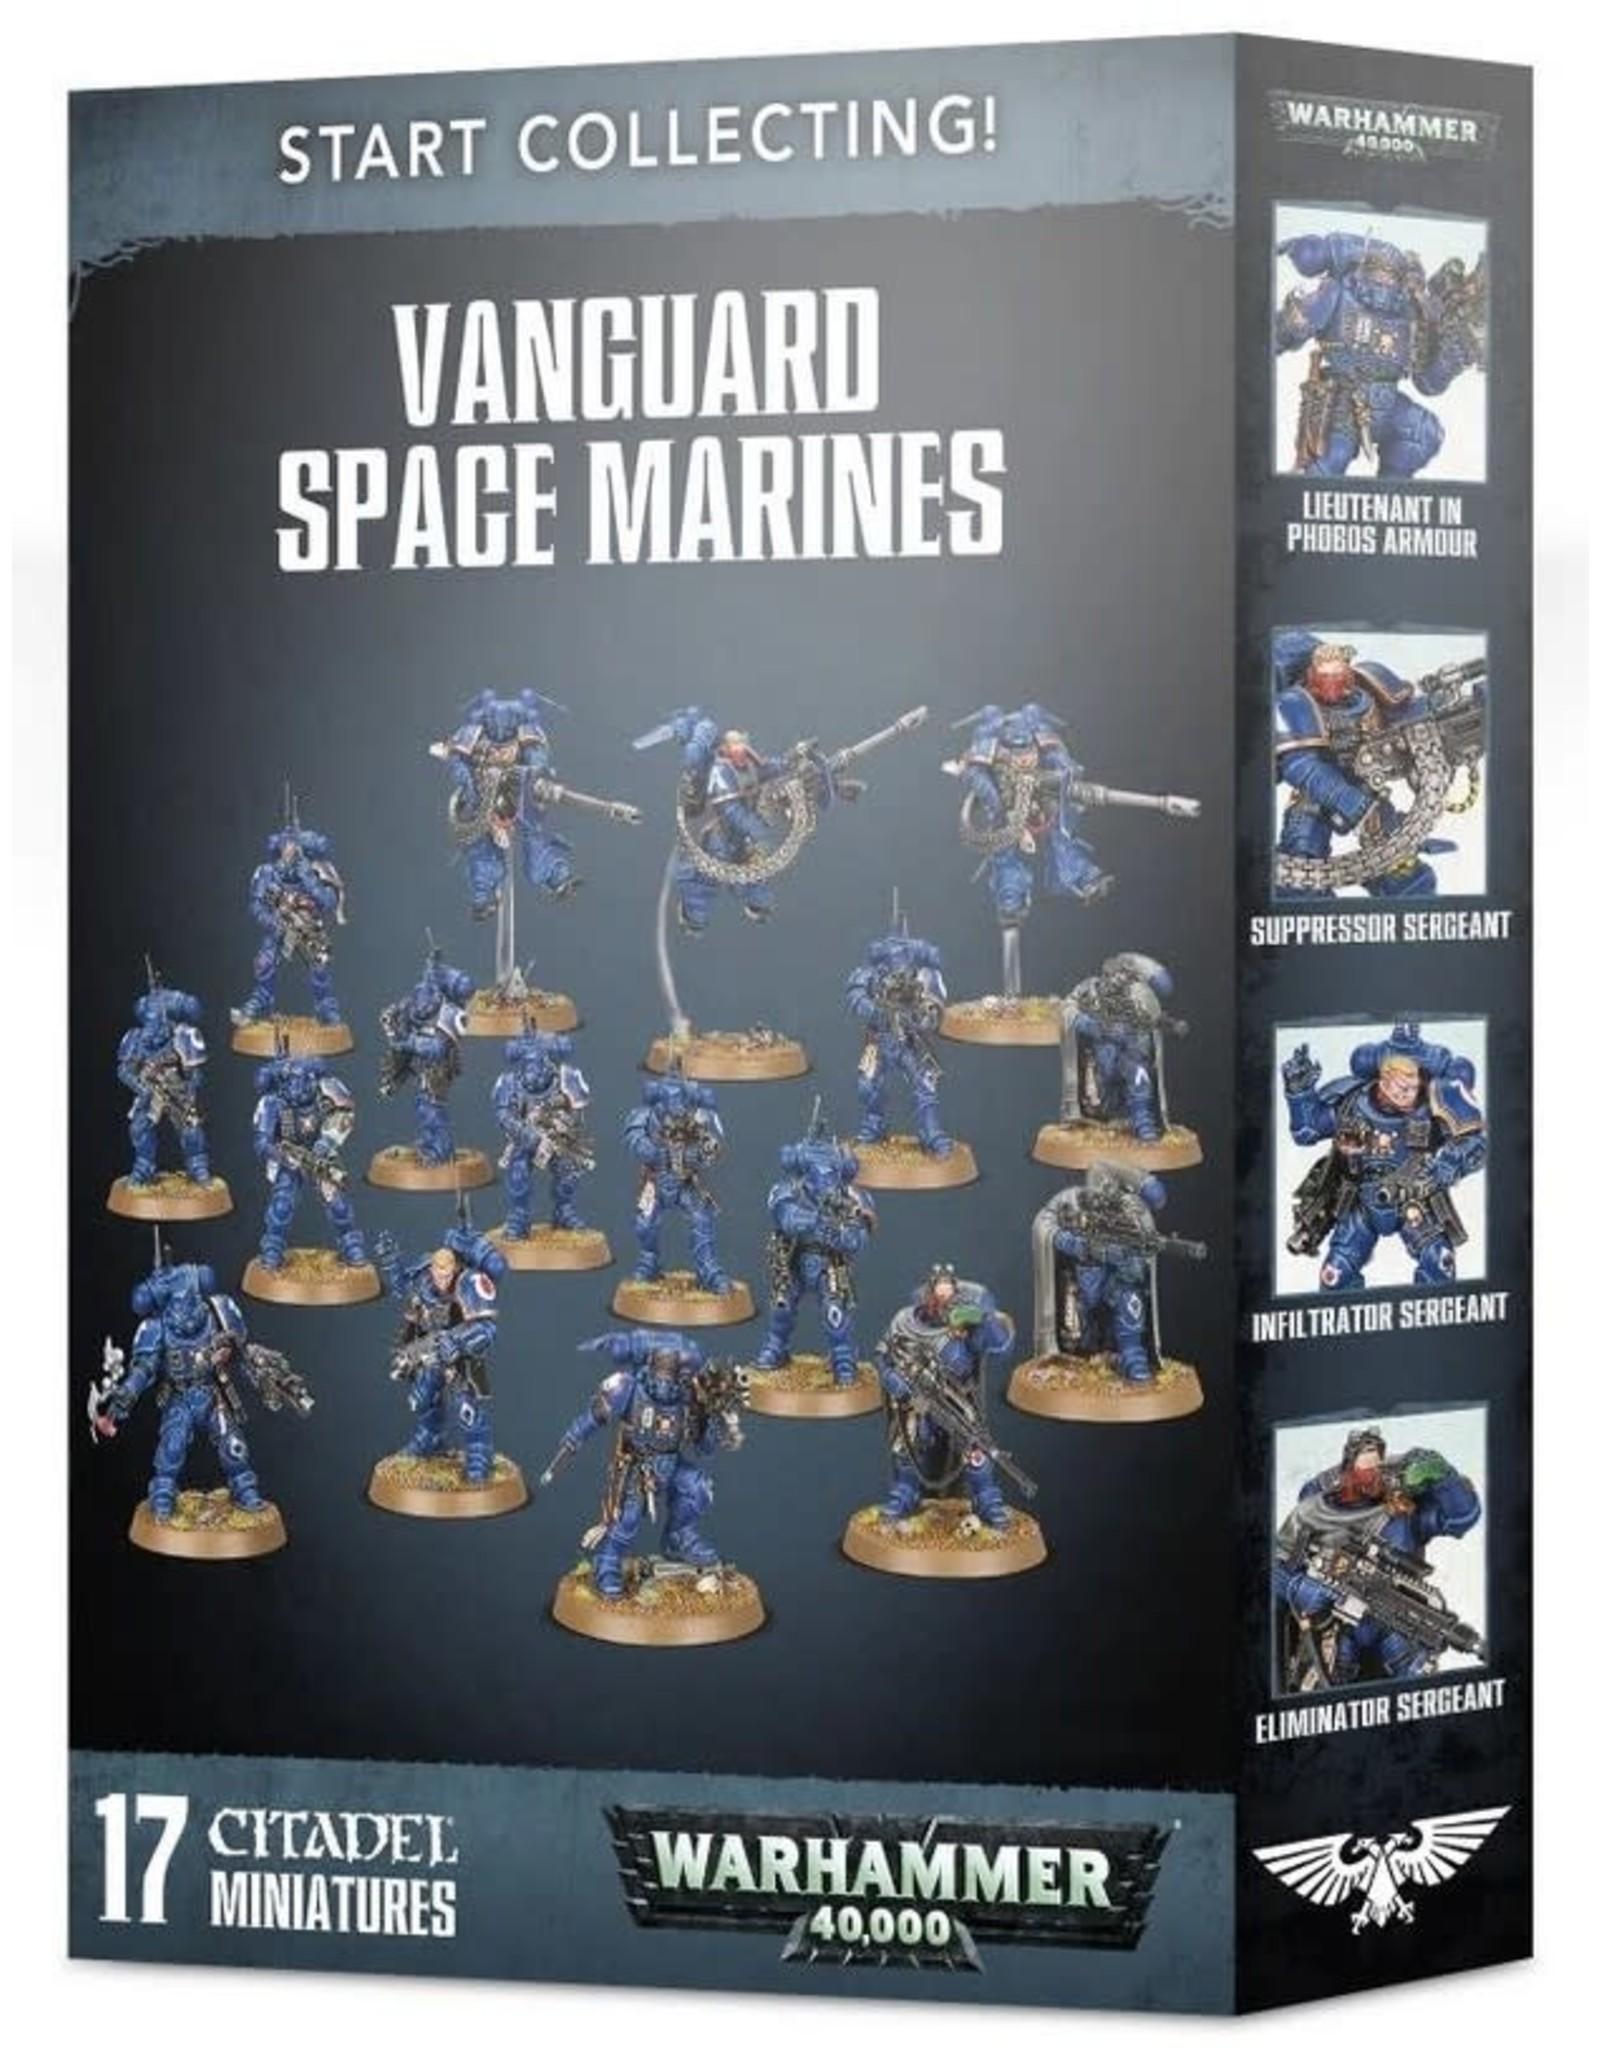 Warhammer 40K WH40K: Start Collecting Vanguard Space Marines